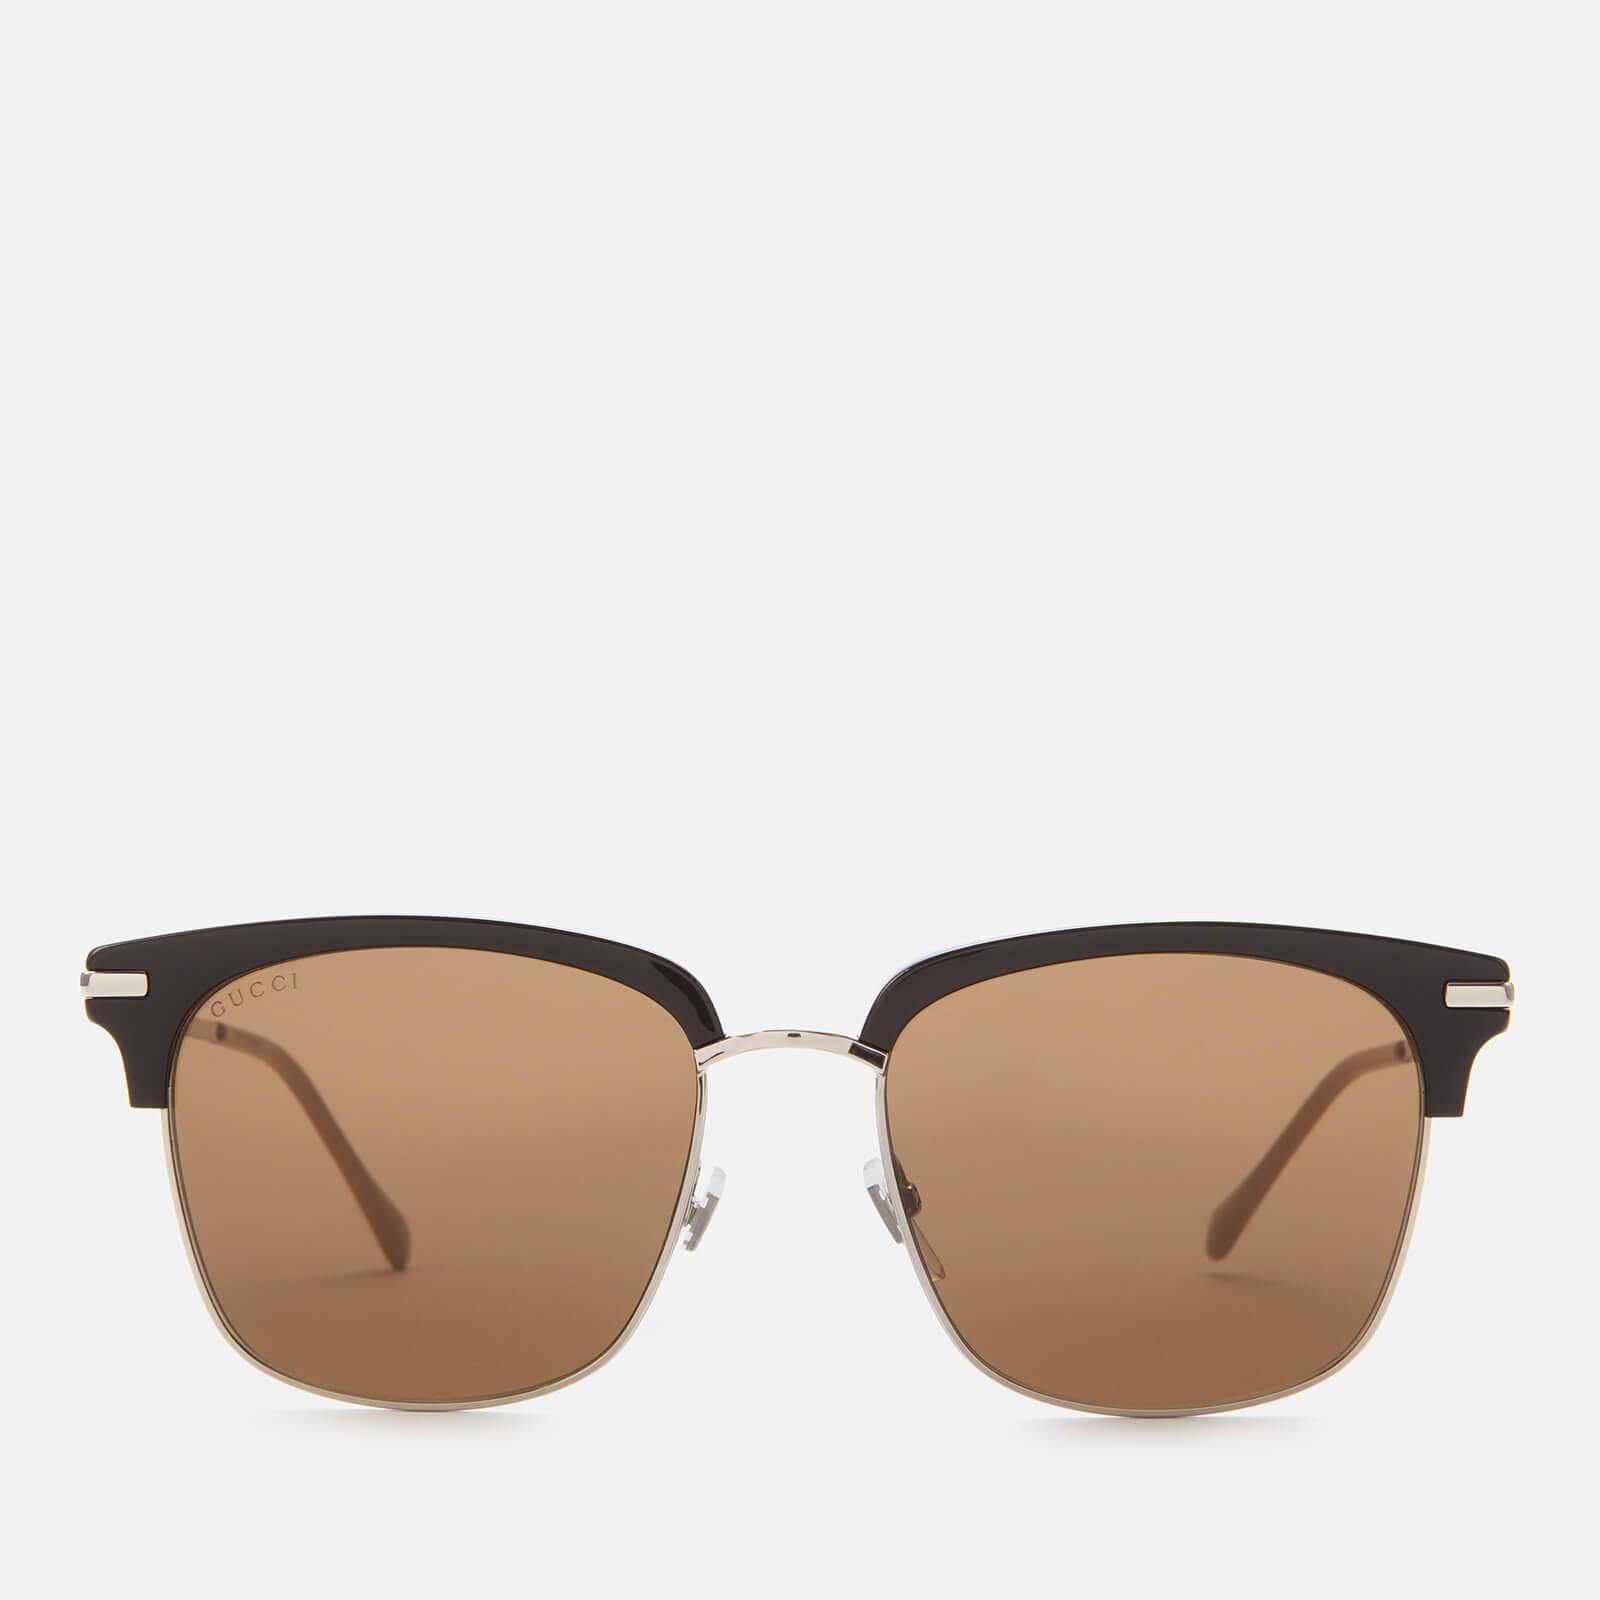 Gucci Men's Metal Sunglasses - Black/Silver/Brown